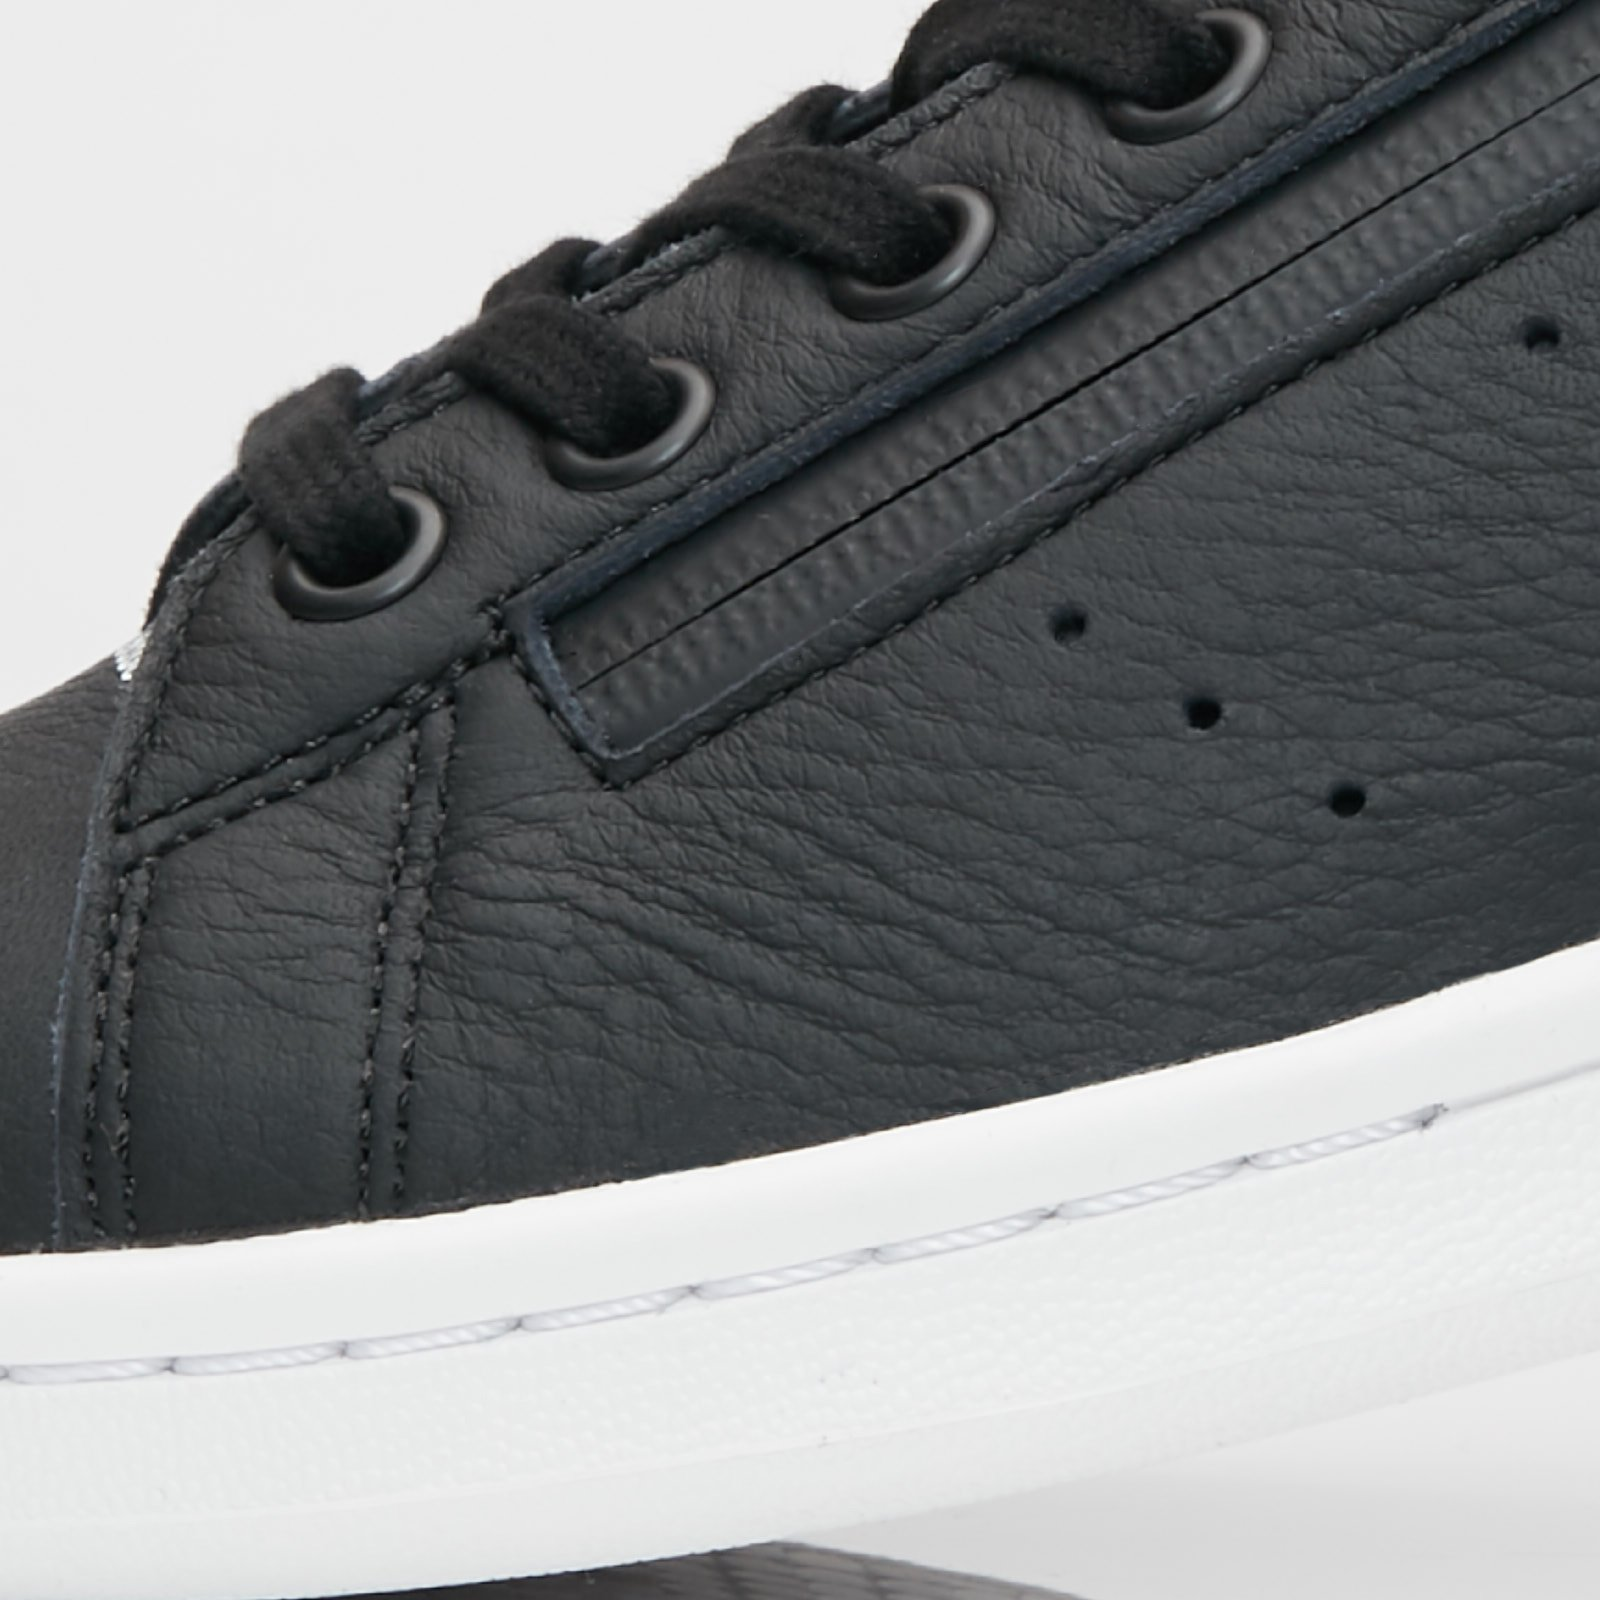 929eb8279f55 adidas Stan Smith MITA - Bb9252 - Sneakersnstuff